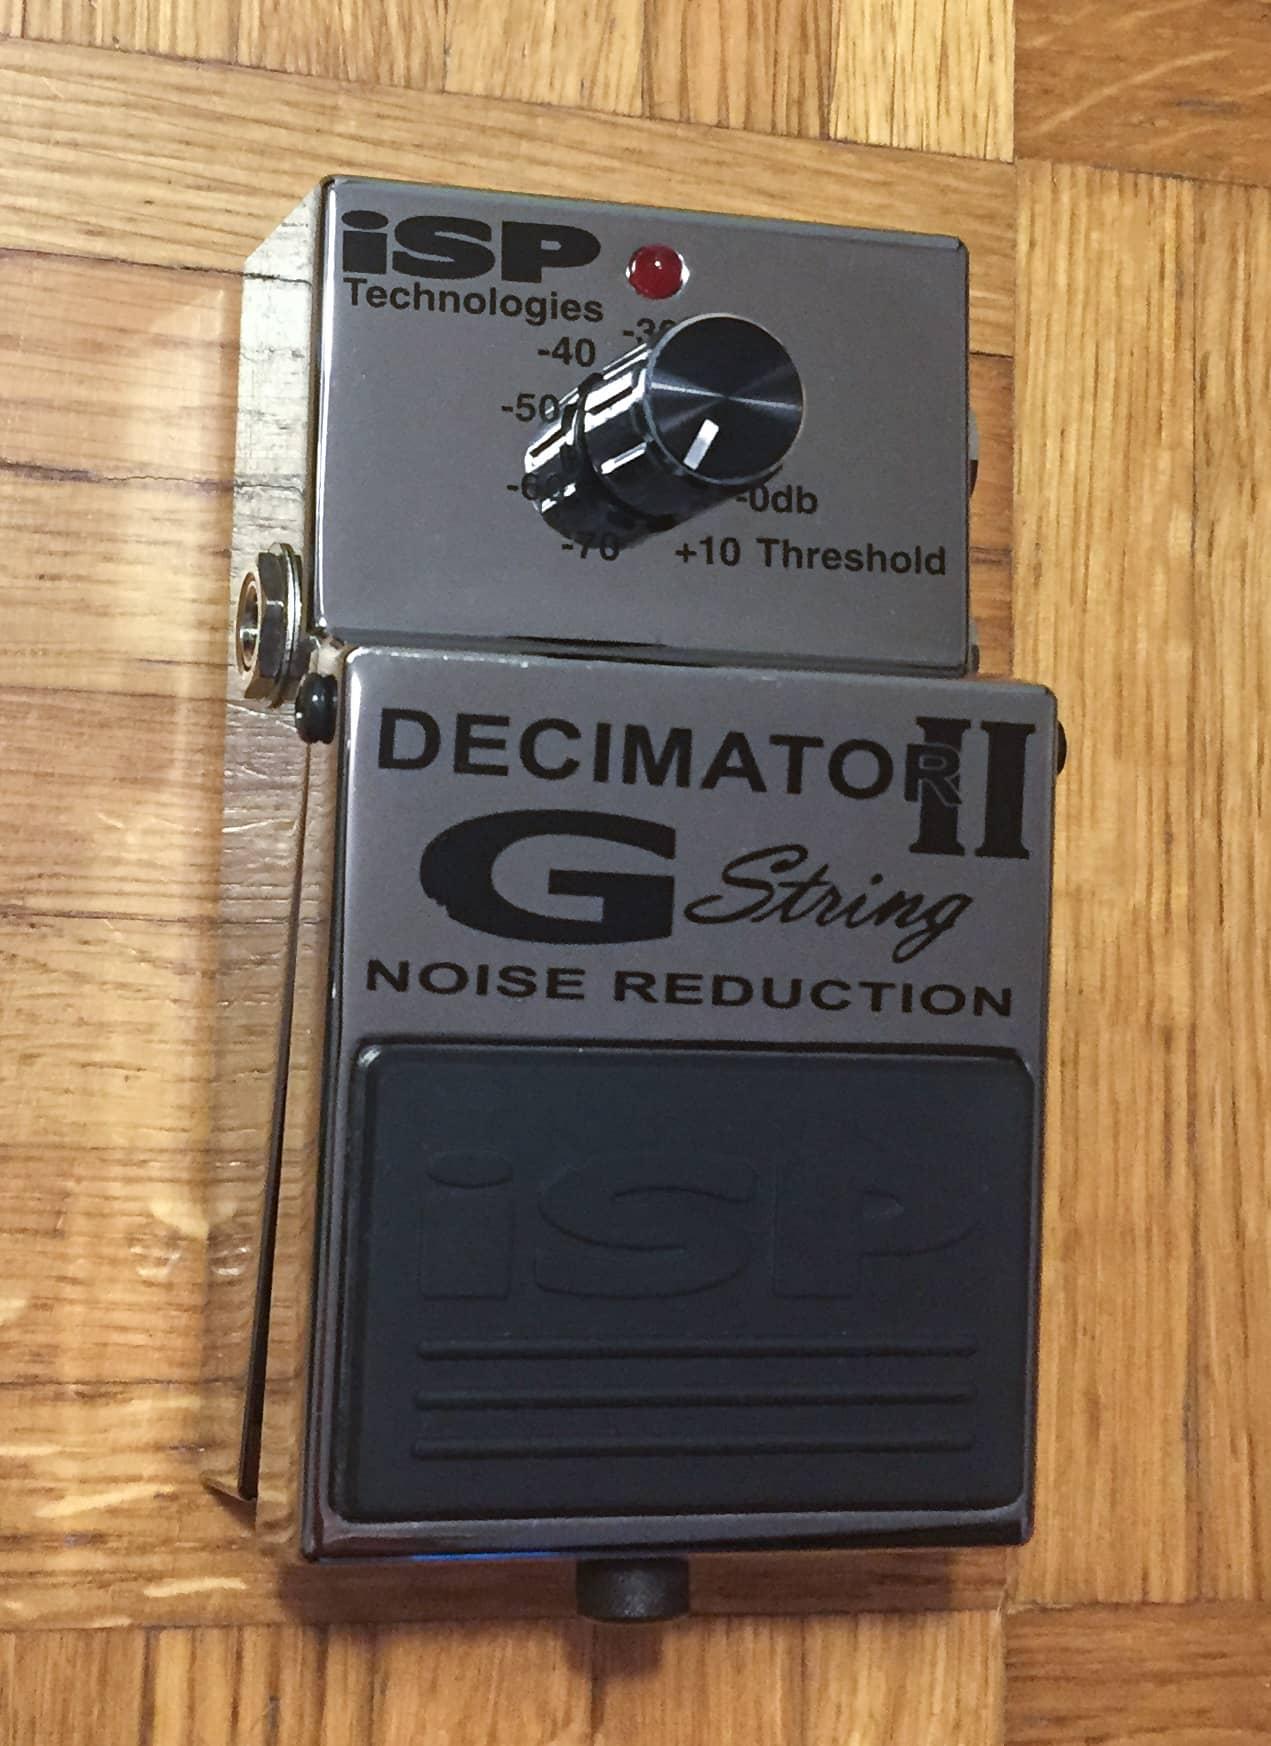 isp decimator g string 2 manual